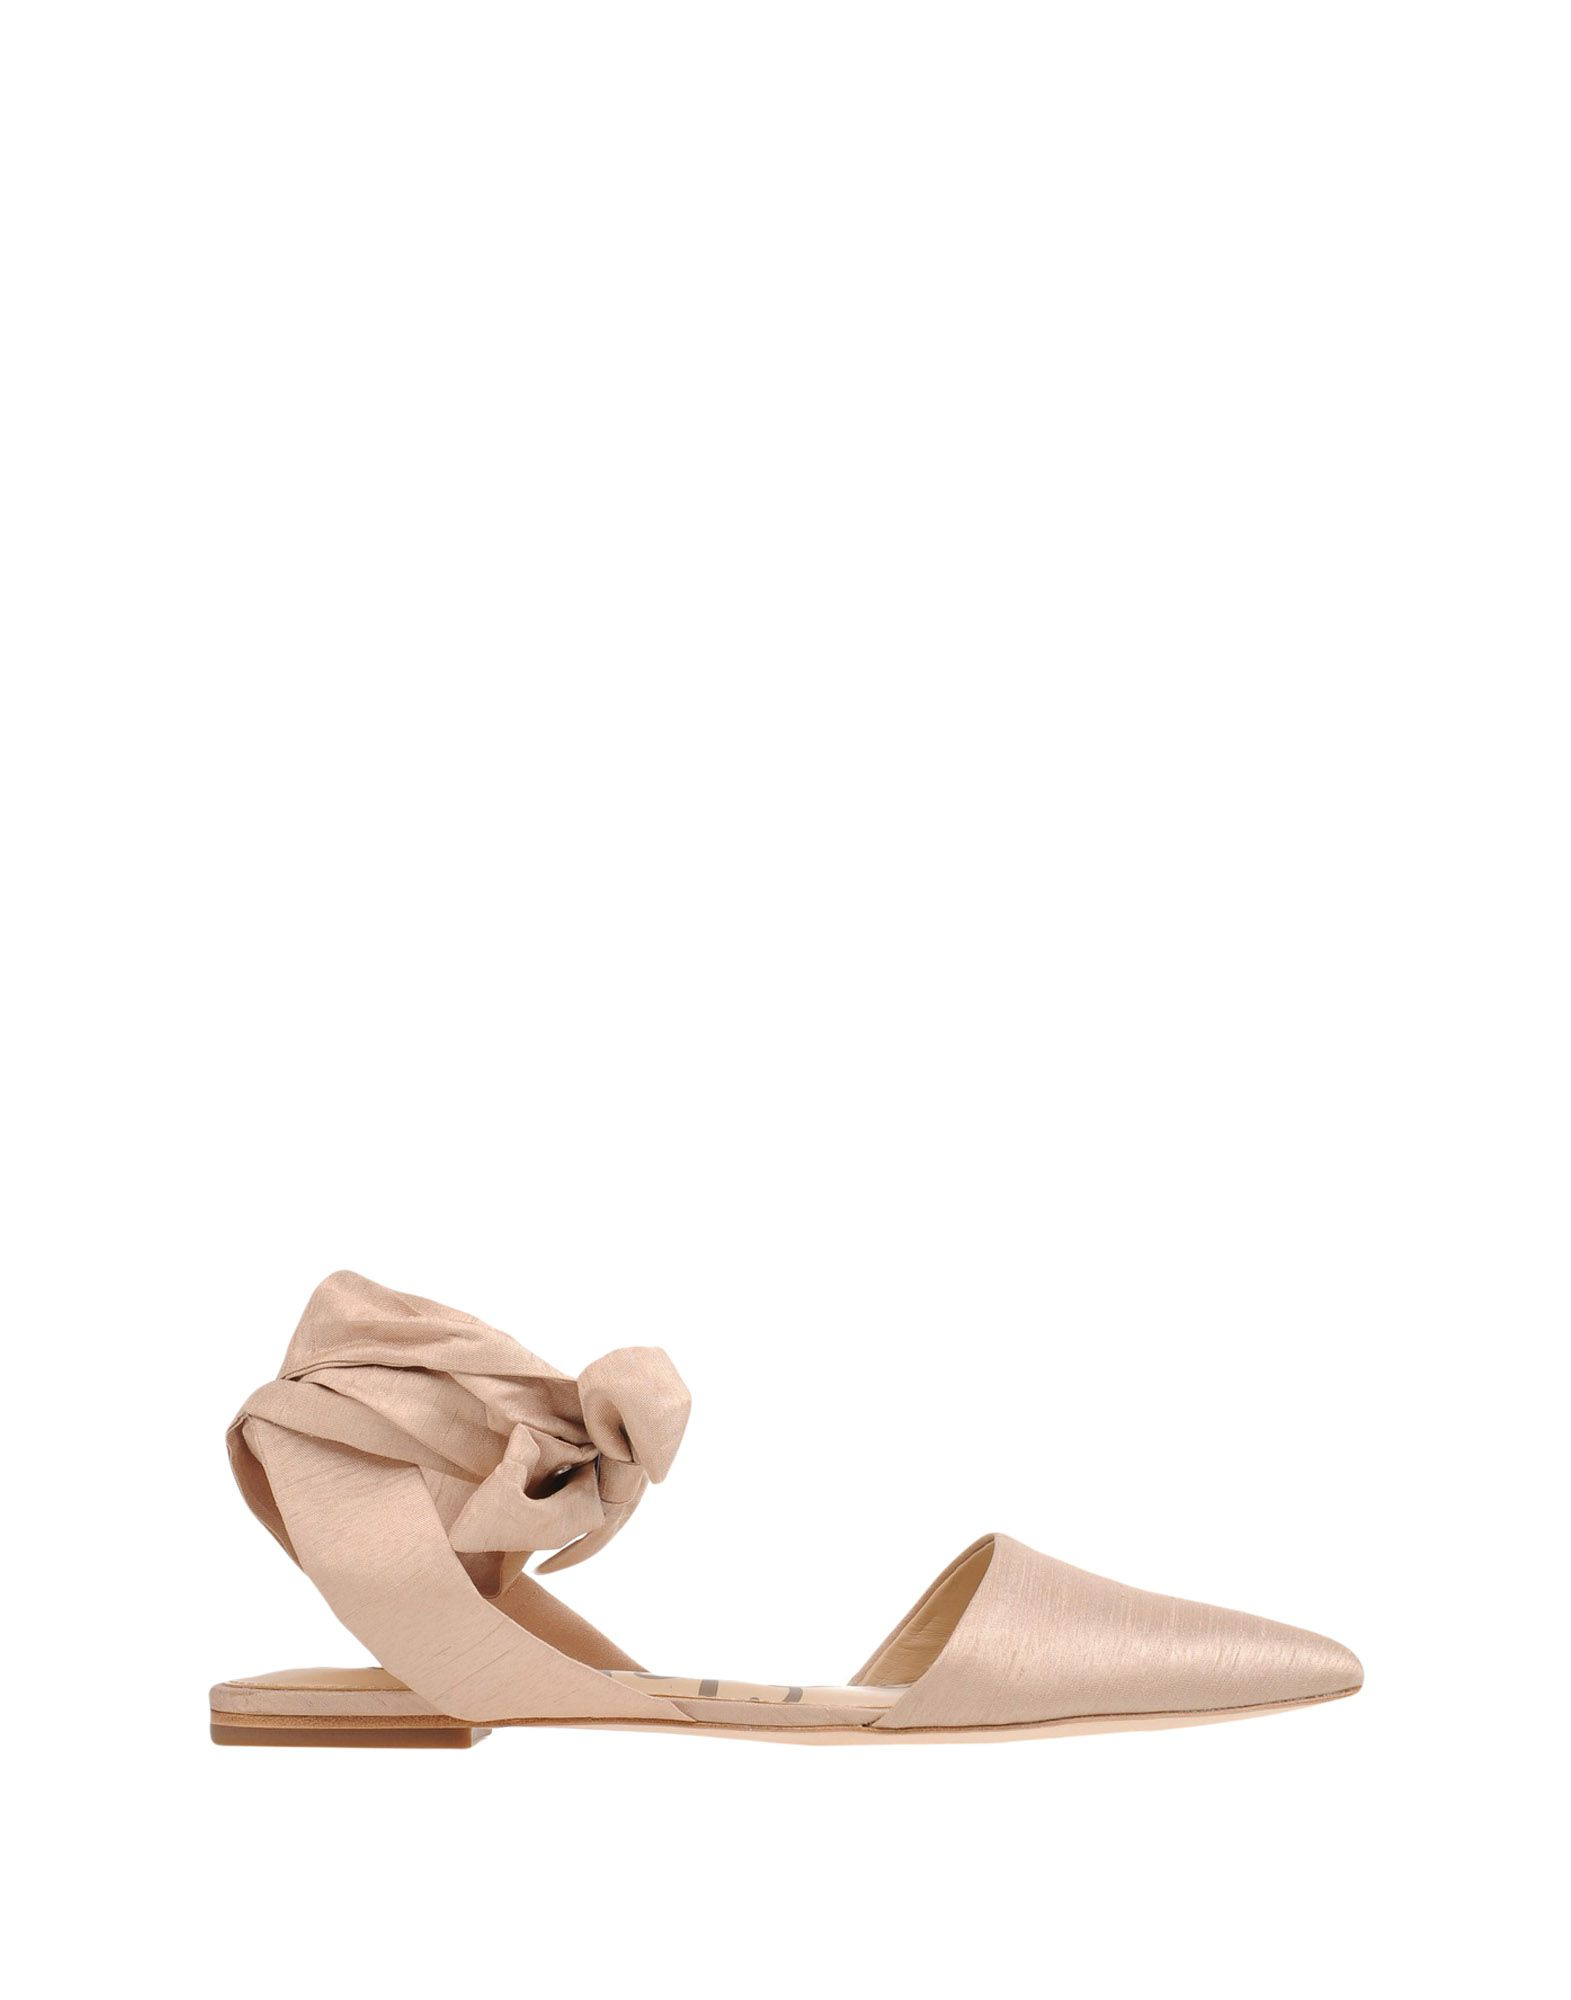 sam sam sam edelman sandales - femmes sam edelman sandales en ligne le royaume - uni - 11339751xu 052f0d